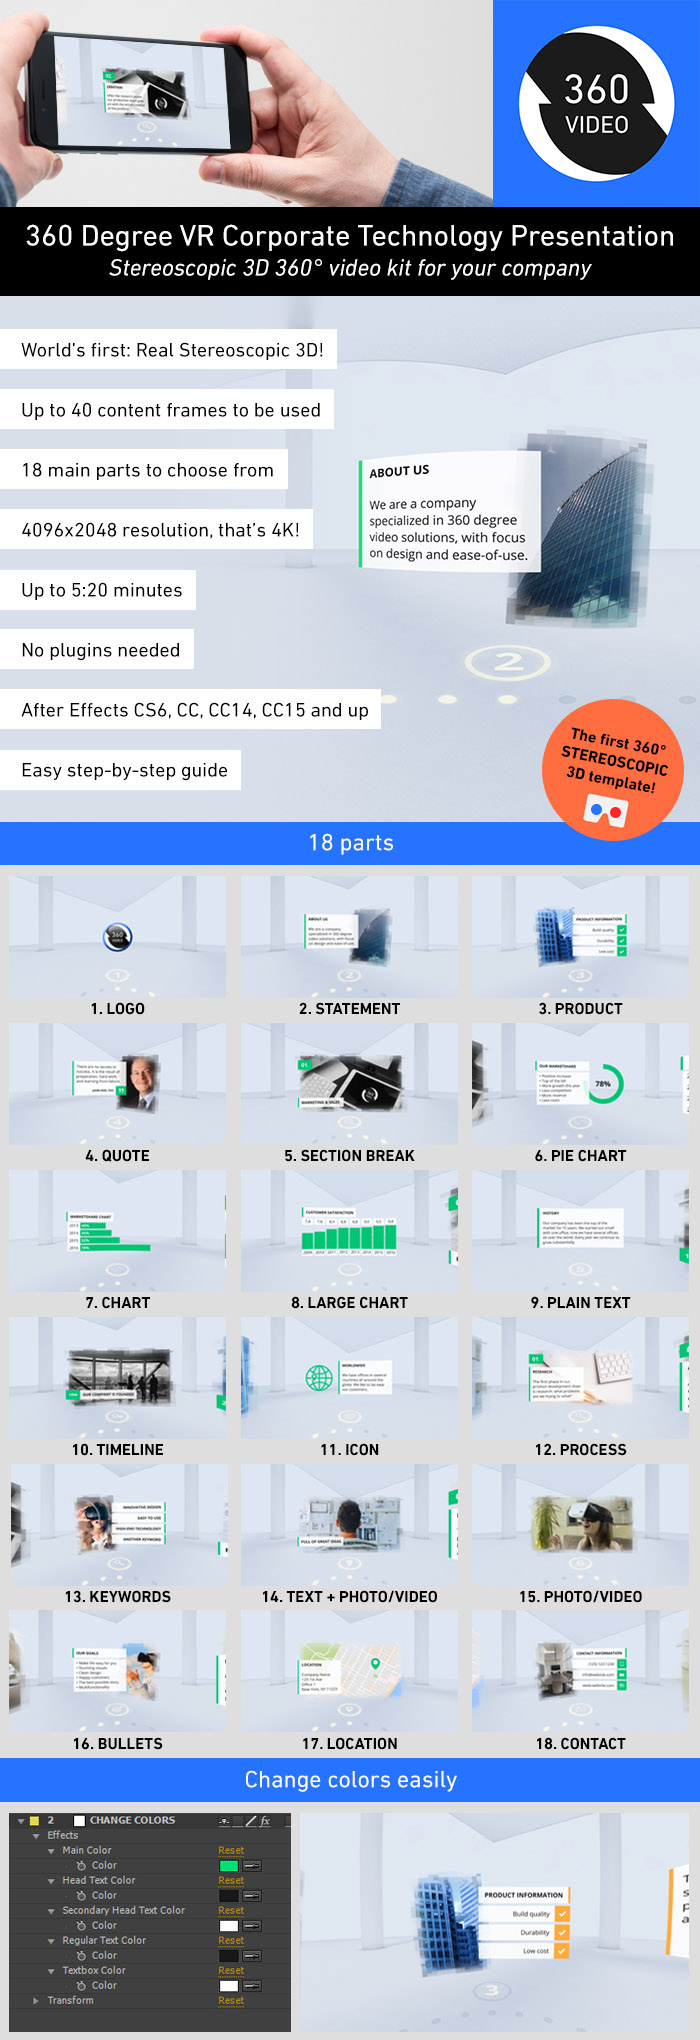 http://www.enjoytheview.nl/wp-content/uploads/2017/12/360-Degree-VR-Corporate-Technology-Presentation-Project-Description-Banner.jpg